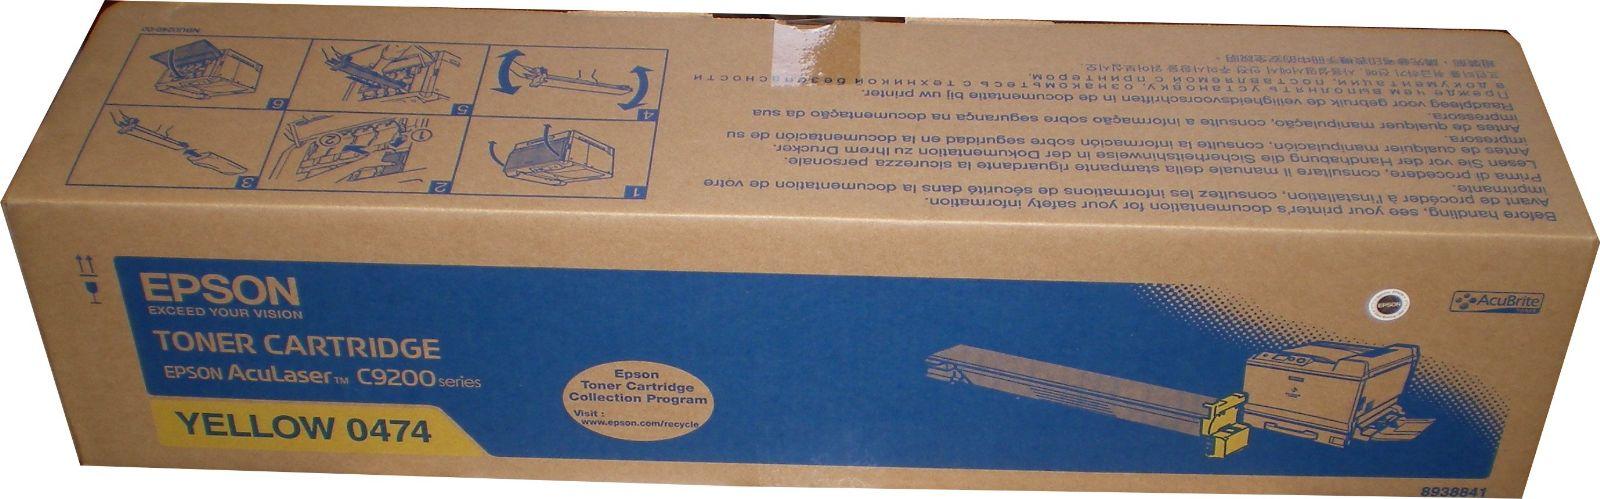 Mực in Epson S050474 Yellow Toner Cartridge (S050474)